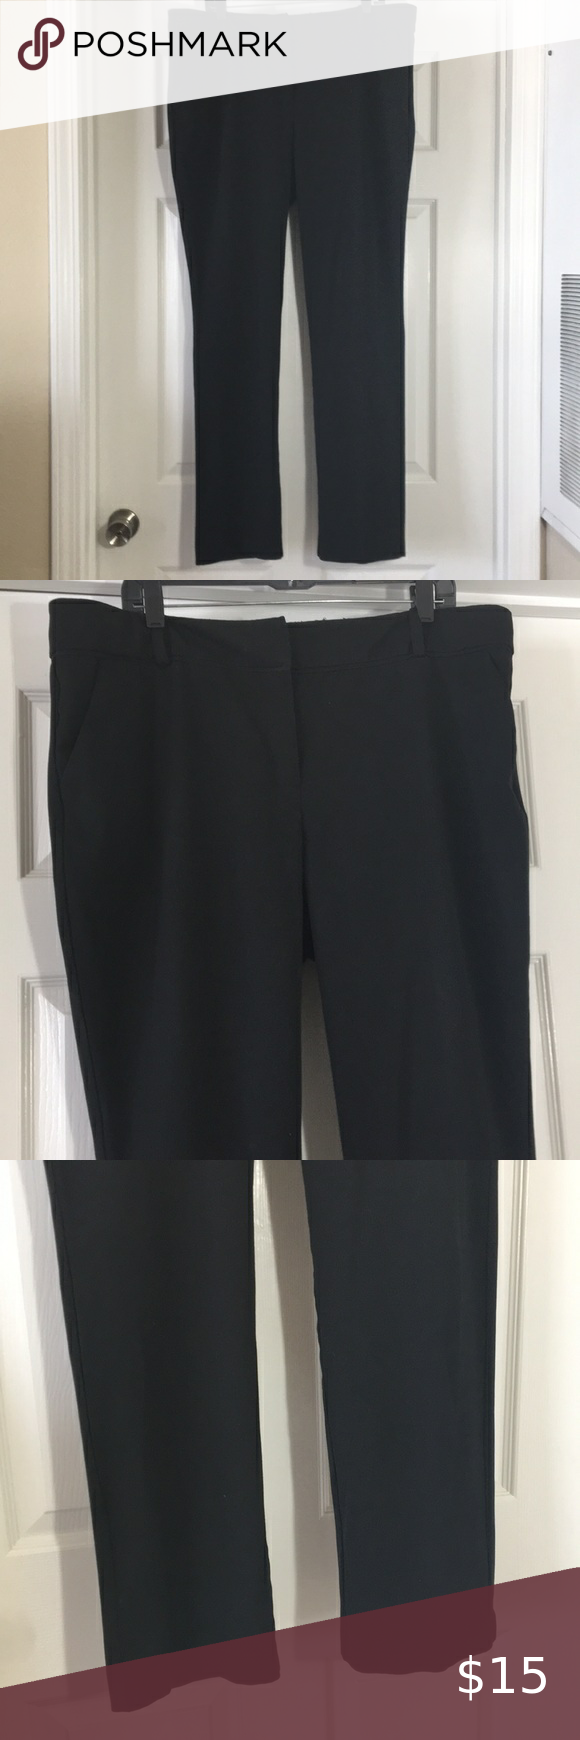 Ny Co 7th Avenue 18 Tall Black Dress Pants Dress Pants Black Dress Pants Dress Trousers [ 1740 x 580 Pixel ]